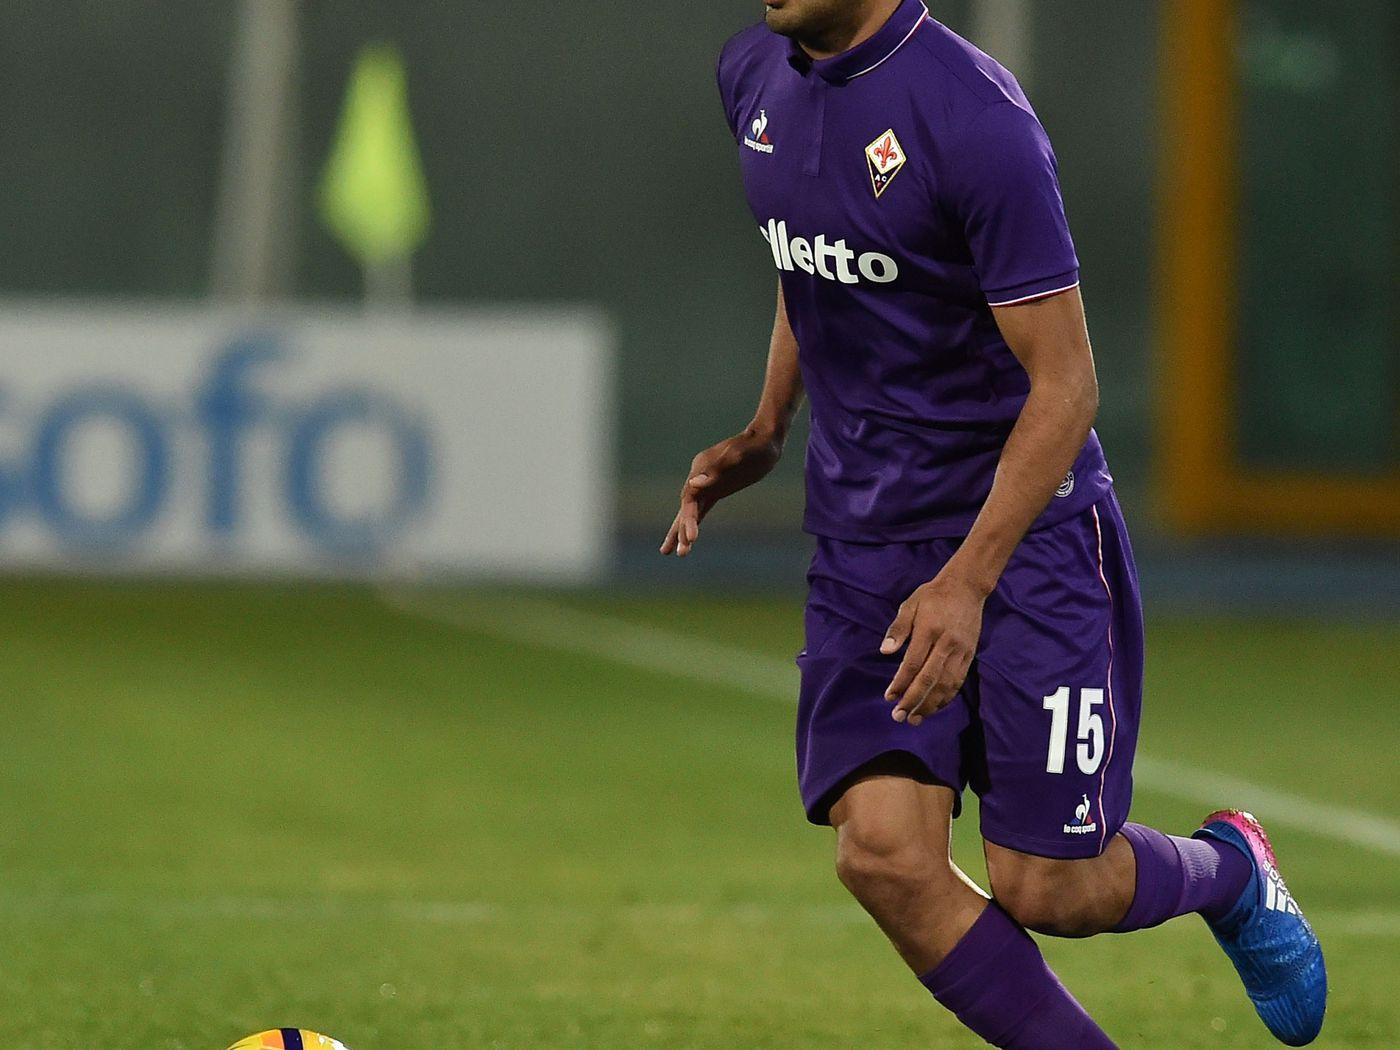 OFFICIAL: Fiorentina sells Maxi Olivera to Club Olimpia - Viola Nation